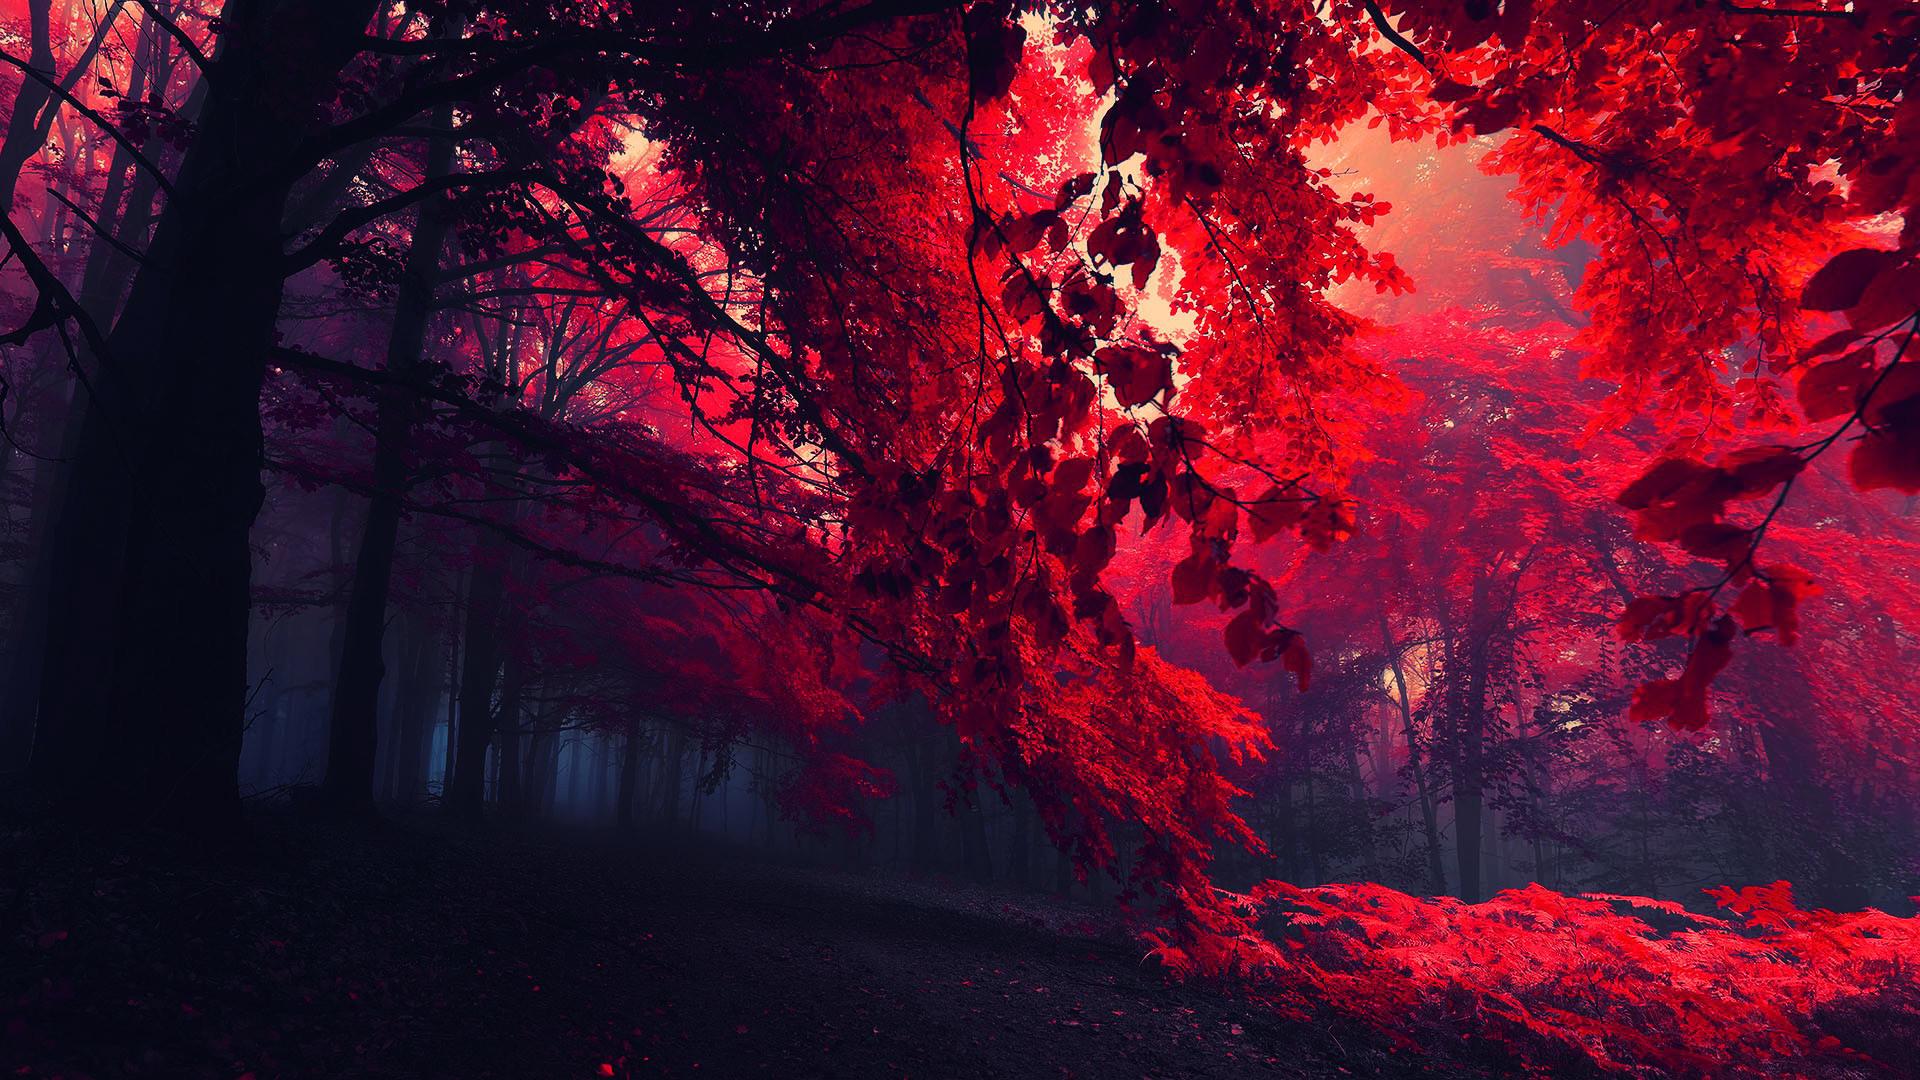 Galaxy S5 Fall Wallpaper Dark Forest Hd Wallpaper 61 Images